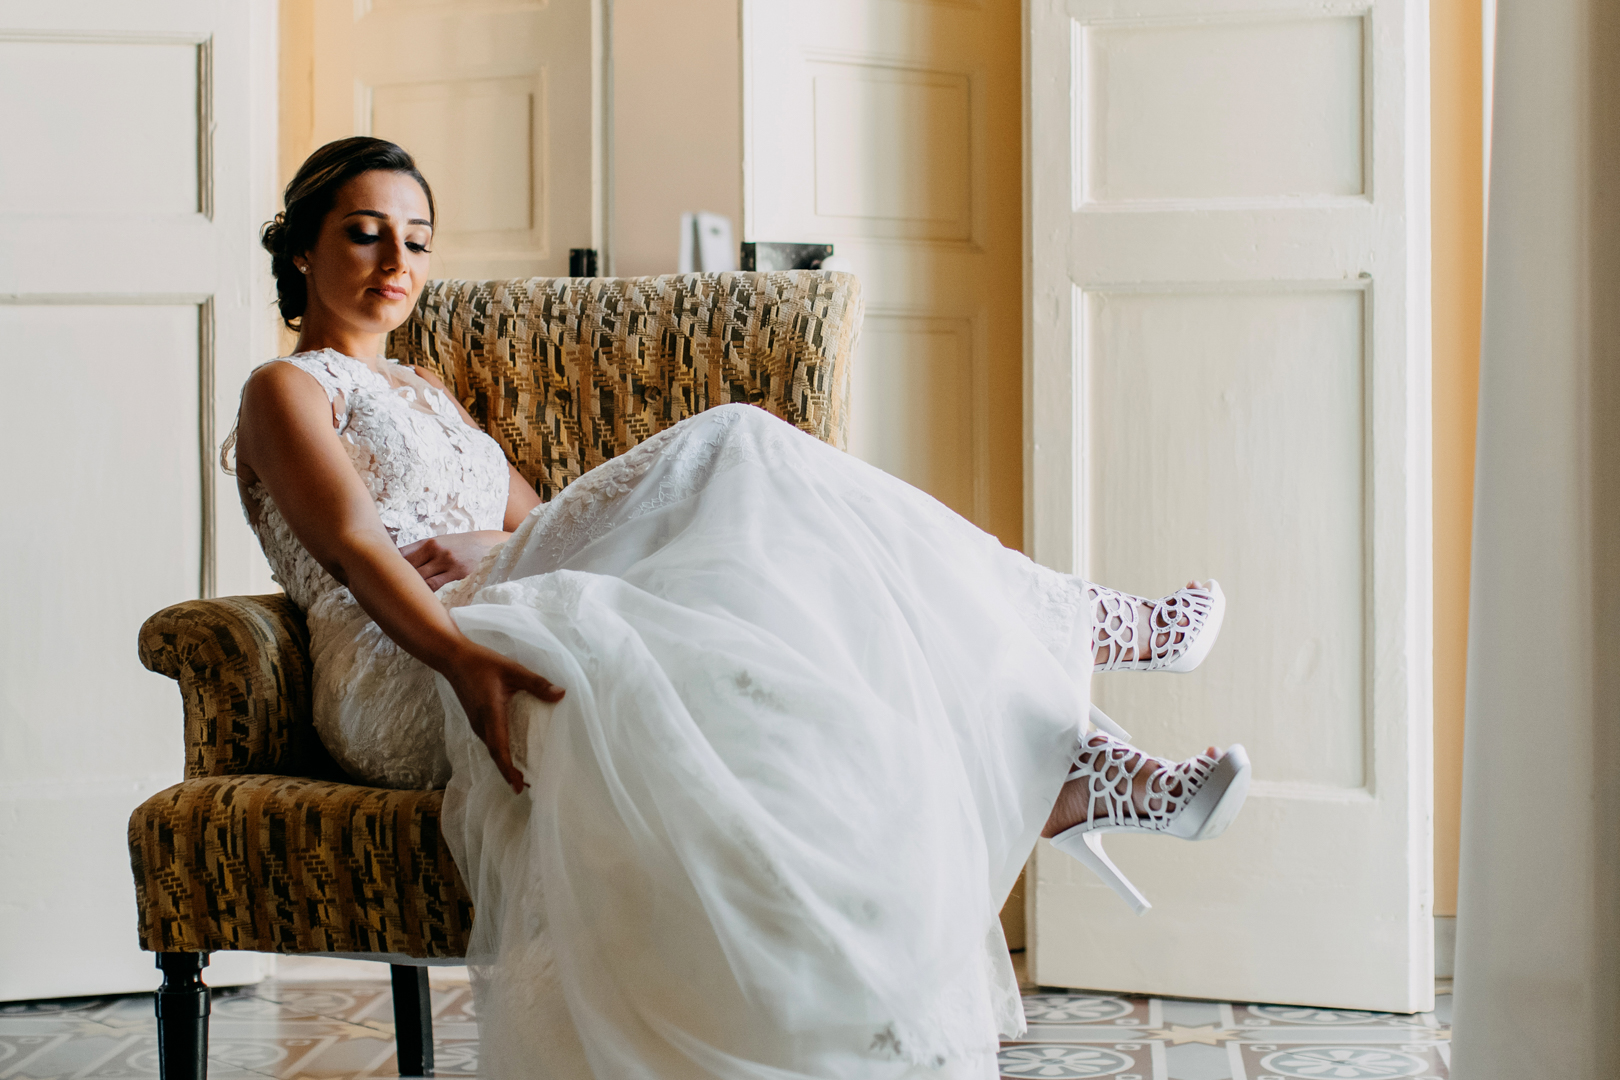 22 gianni-lepore-weddingday-weddingdress-sposa-bride-